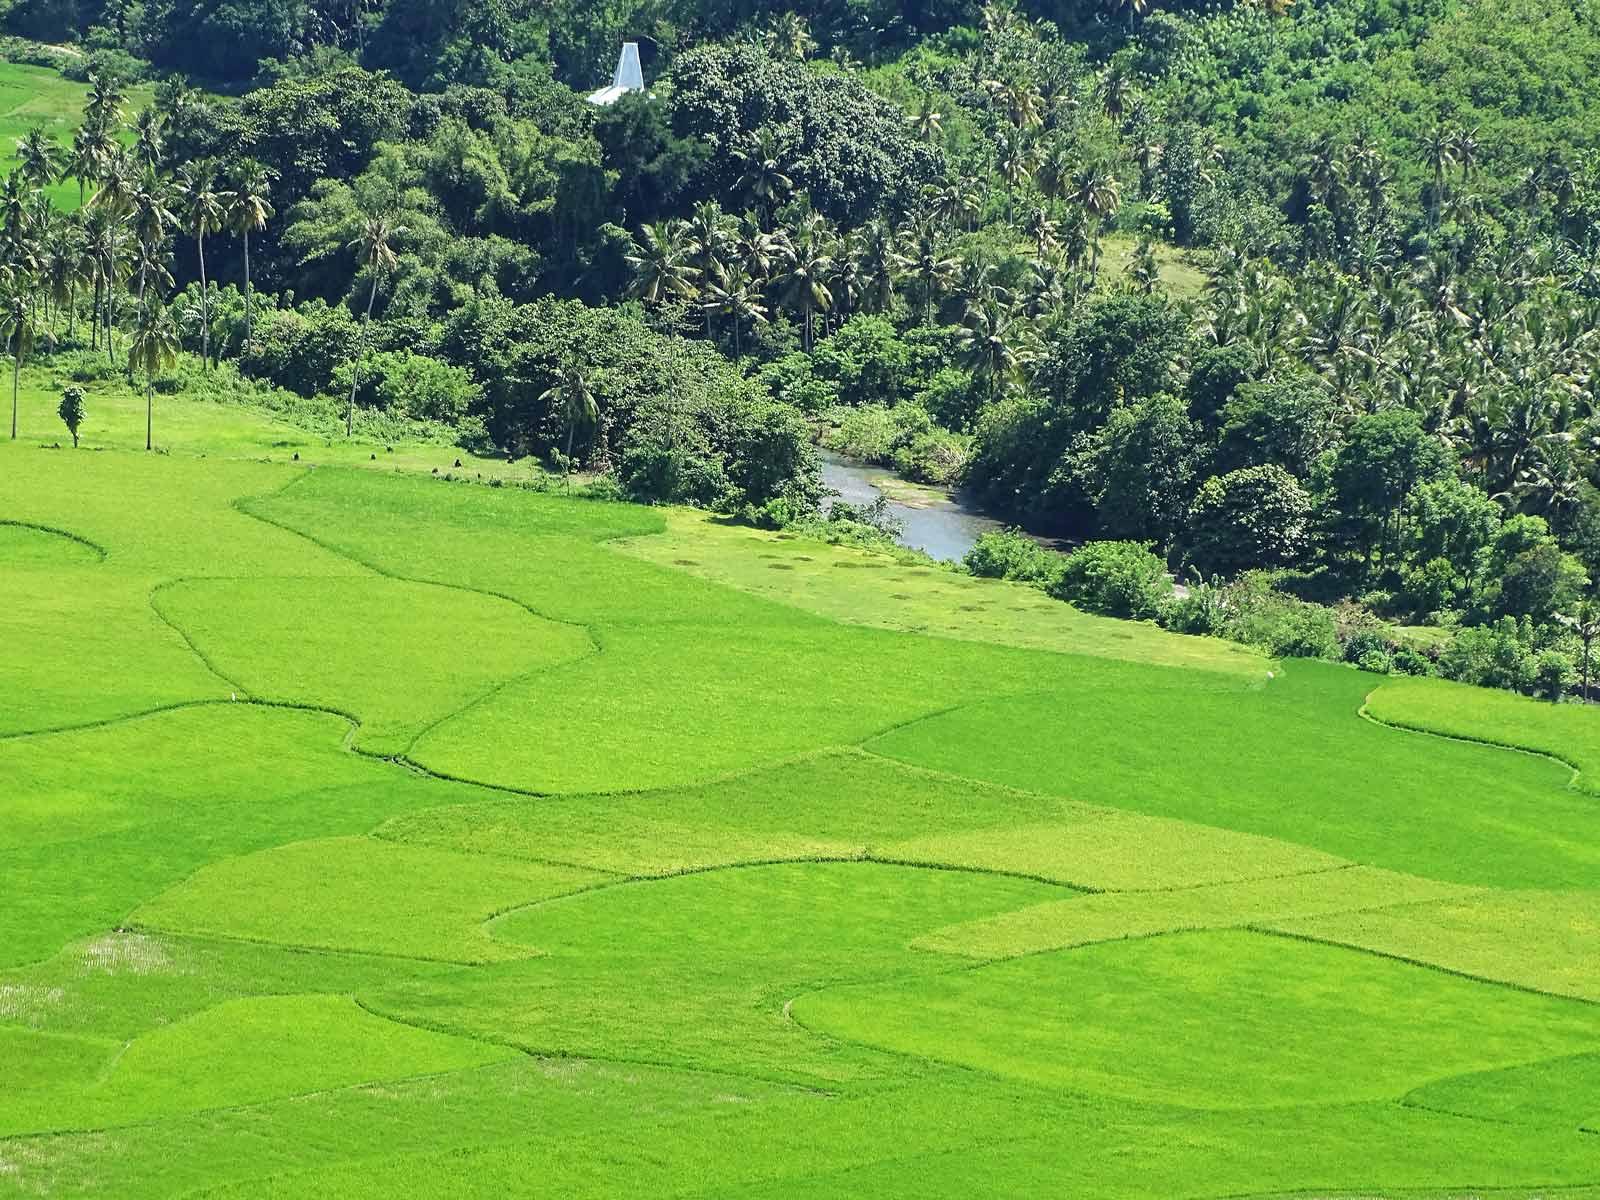 rondreis sumba lamboya district liling 10